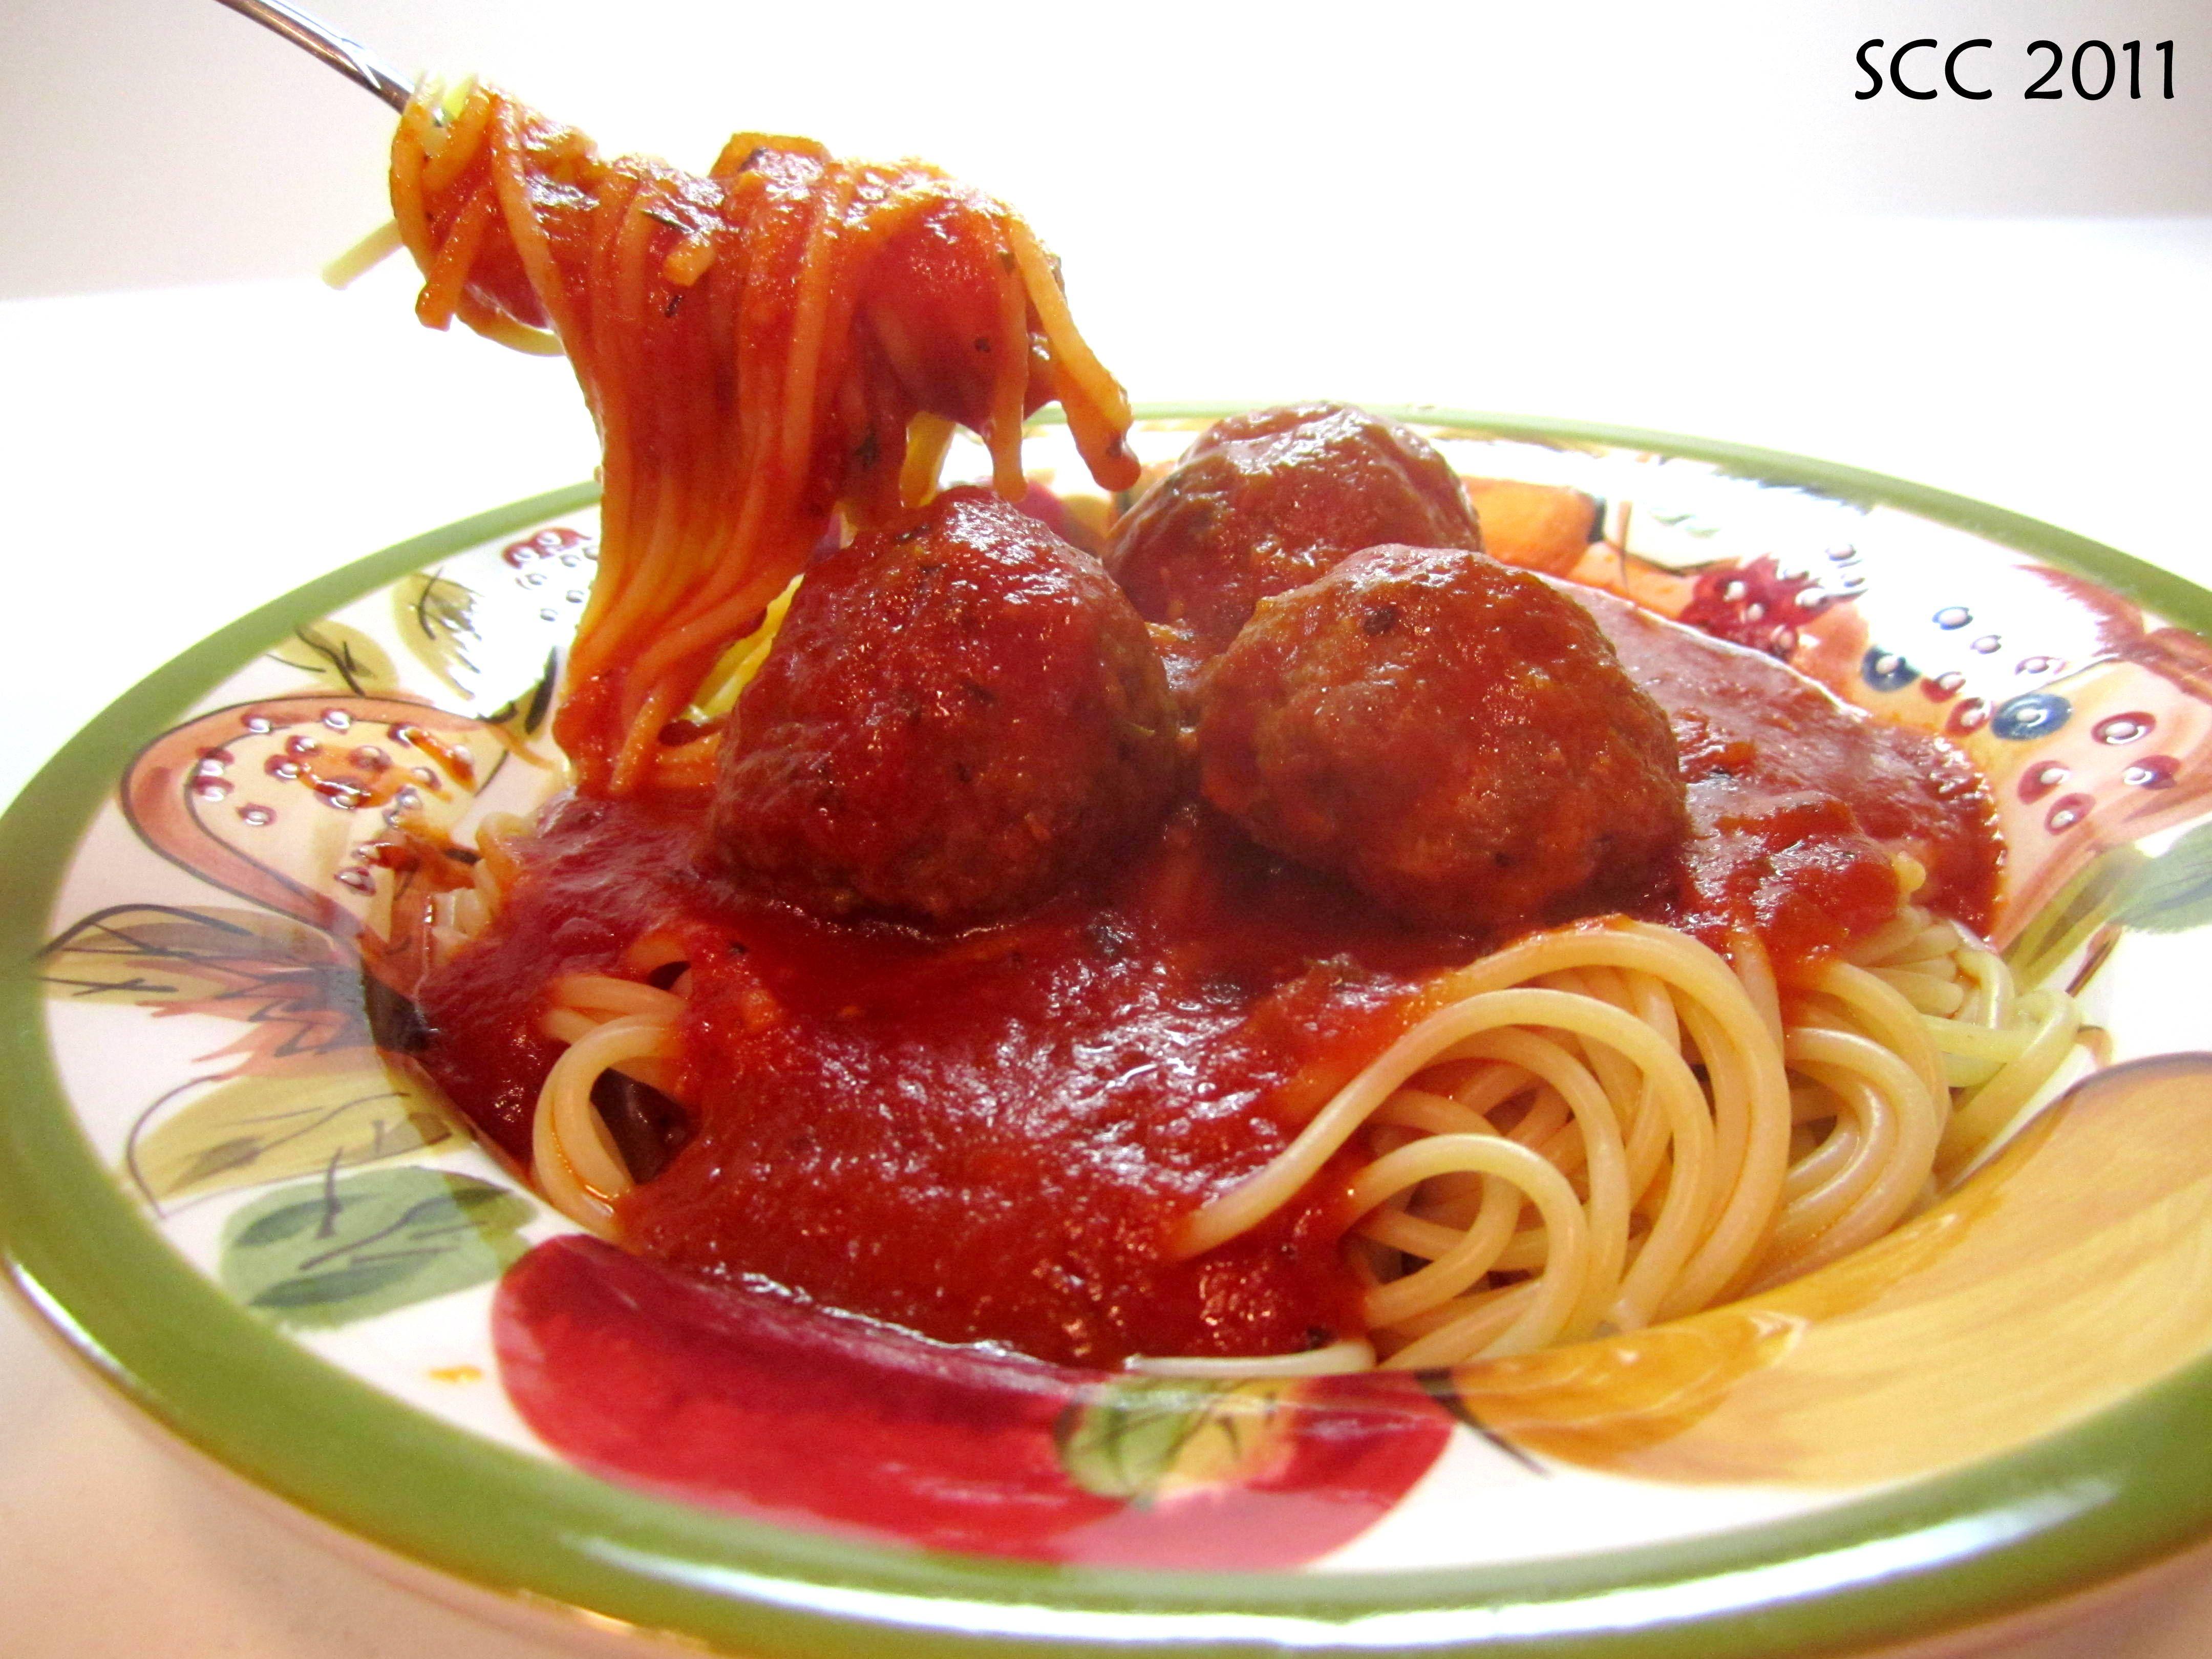 8bec621f54d8d9fe9de3a70e2a6c54ec - Better Homes And Gardens Spaghetti Sauce